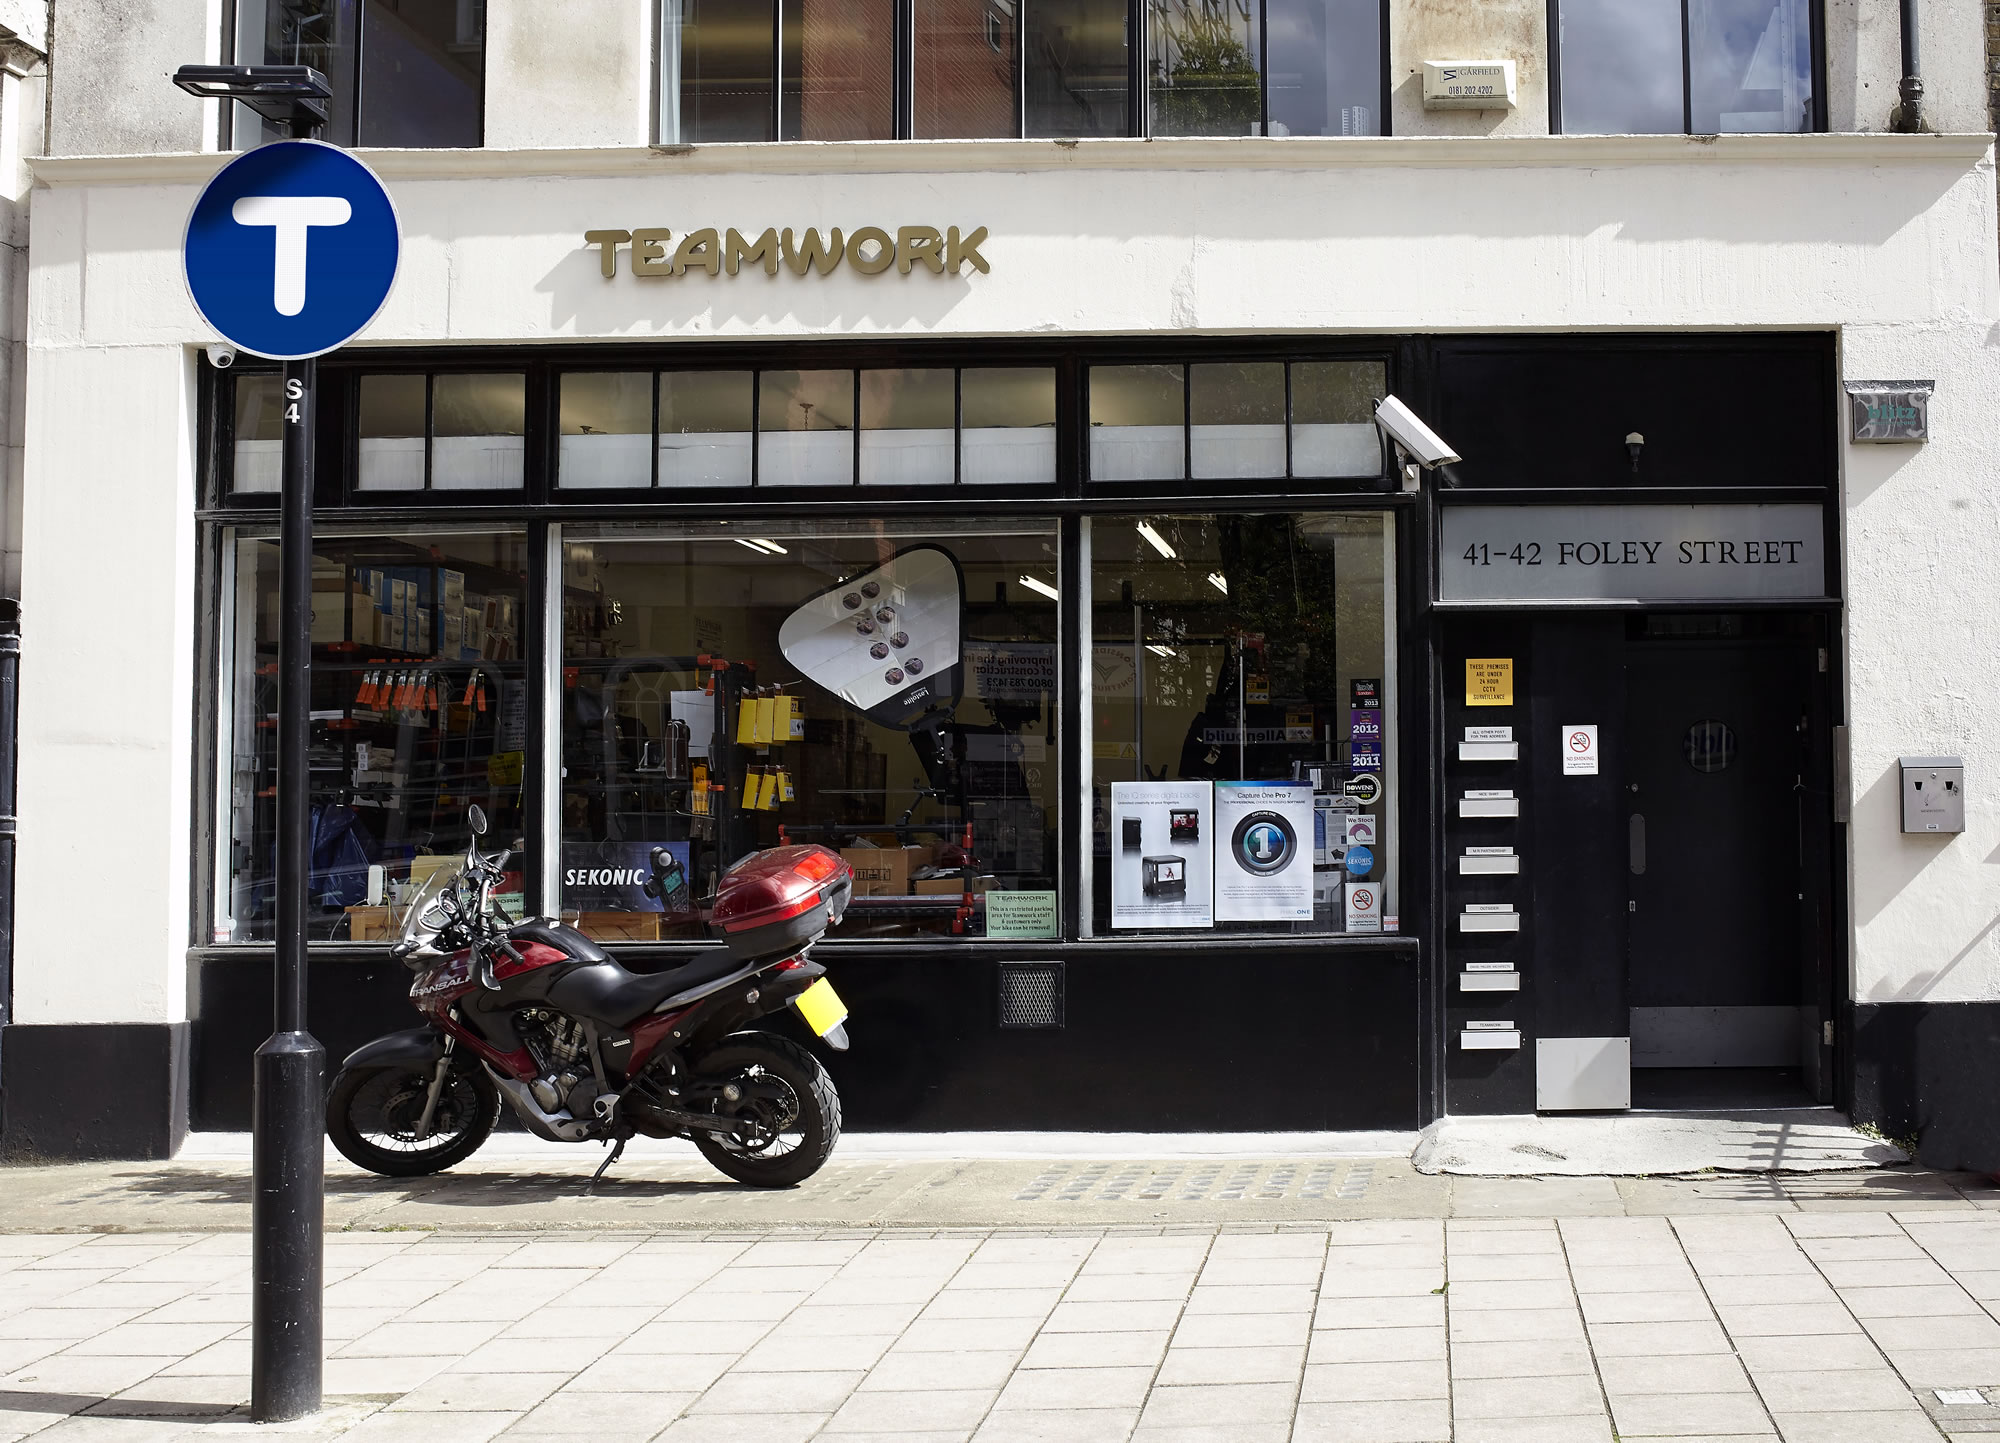 Teamwork Shop Front